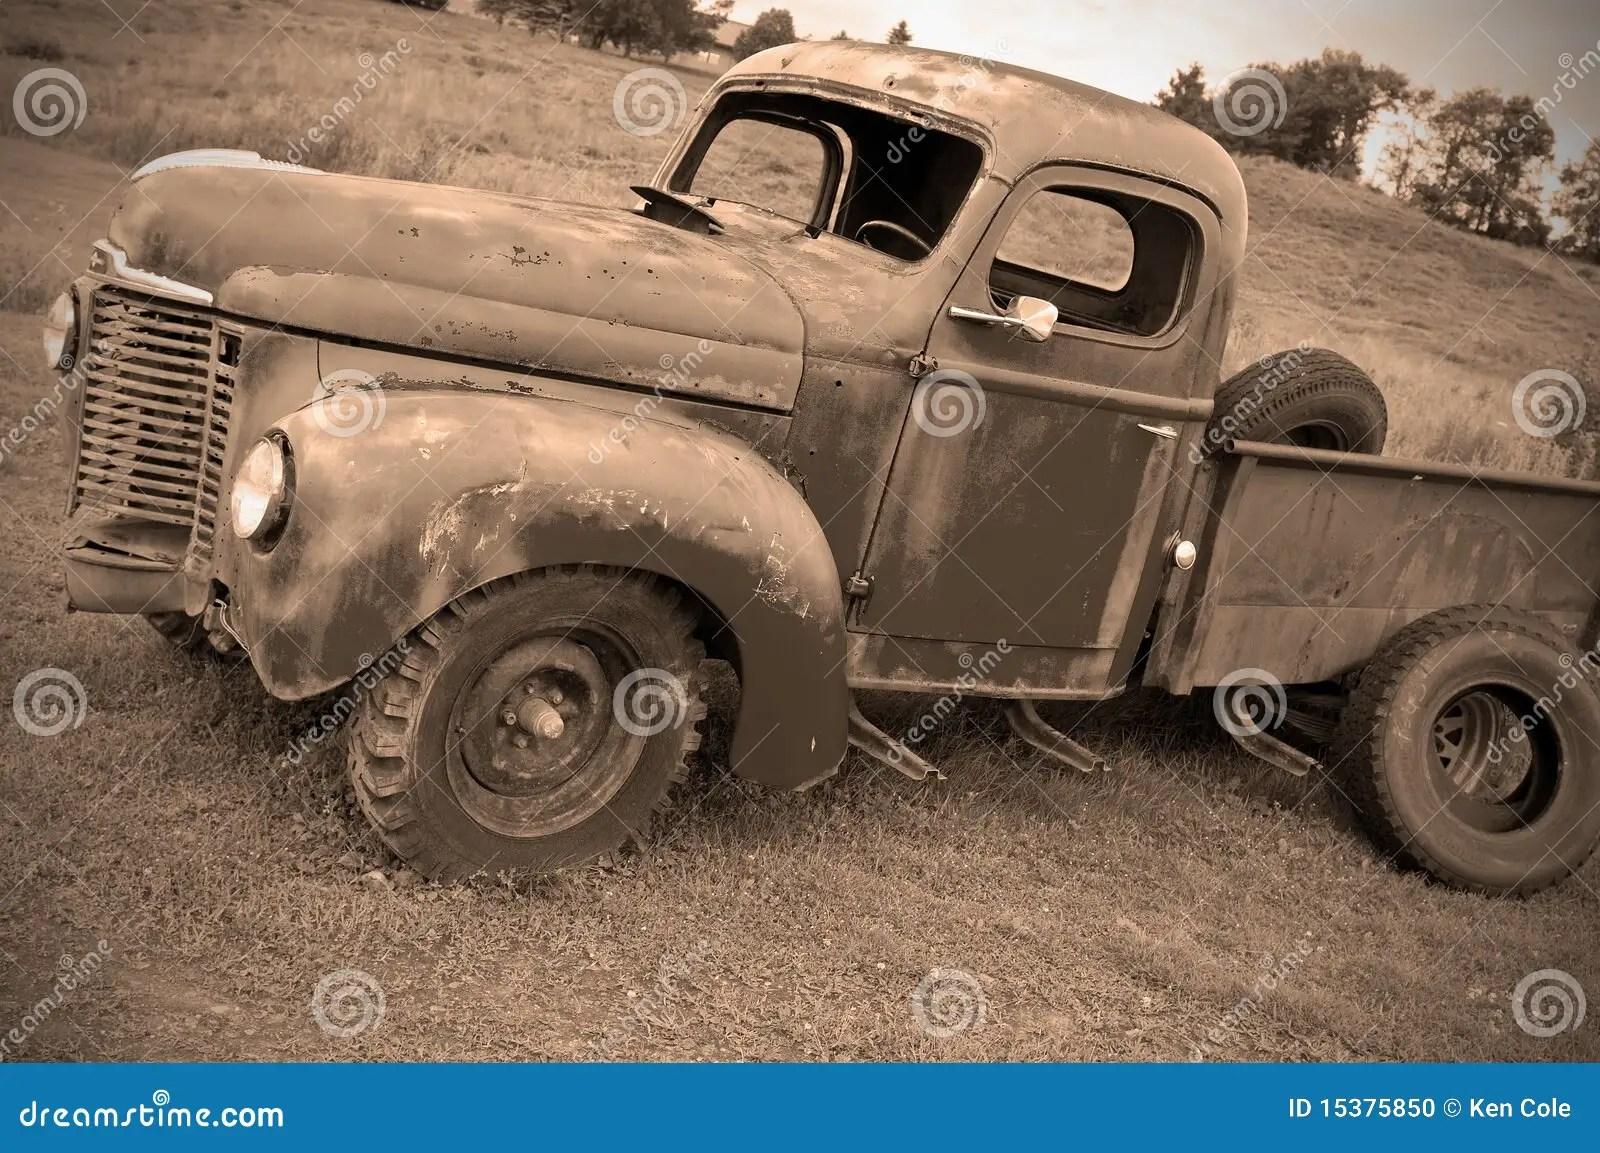 Farm Trucks Old Abandoned